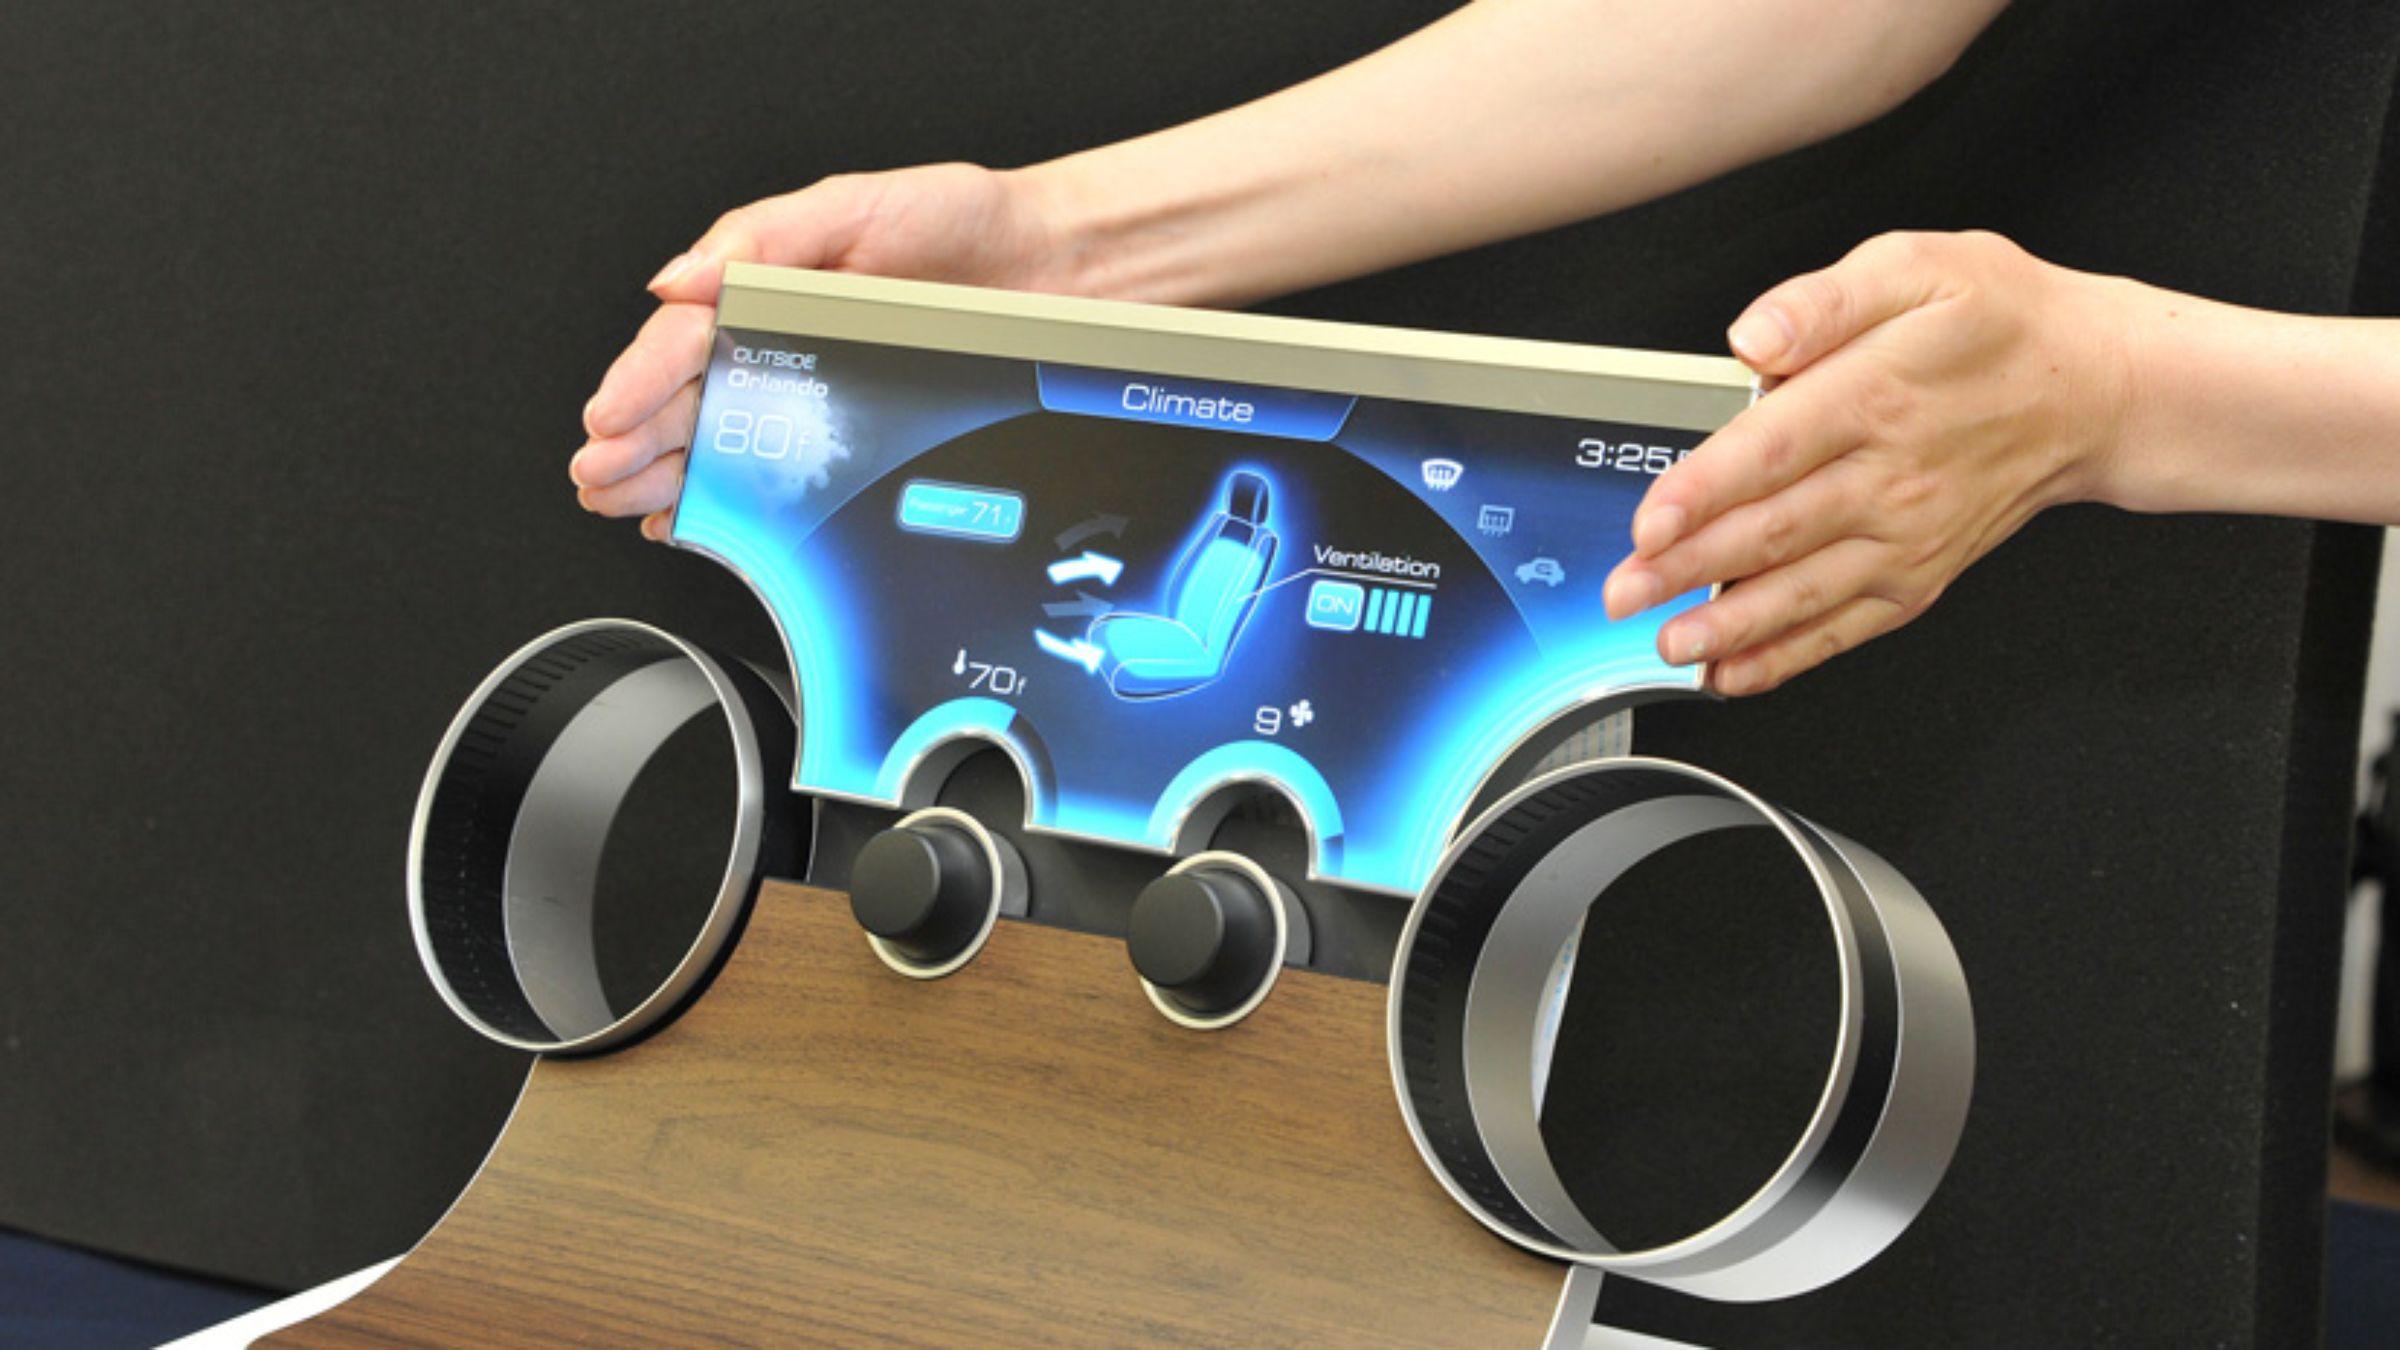 Report: Nintendo eyeing shape-shifting LCD screens from Sharp